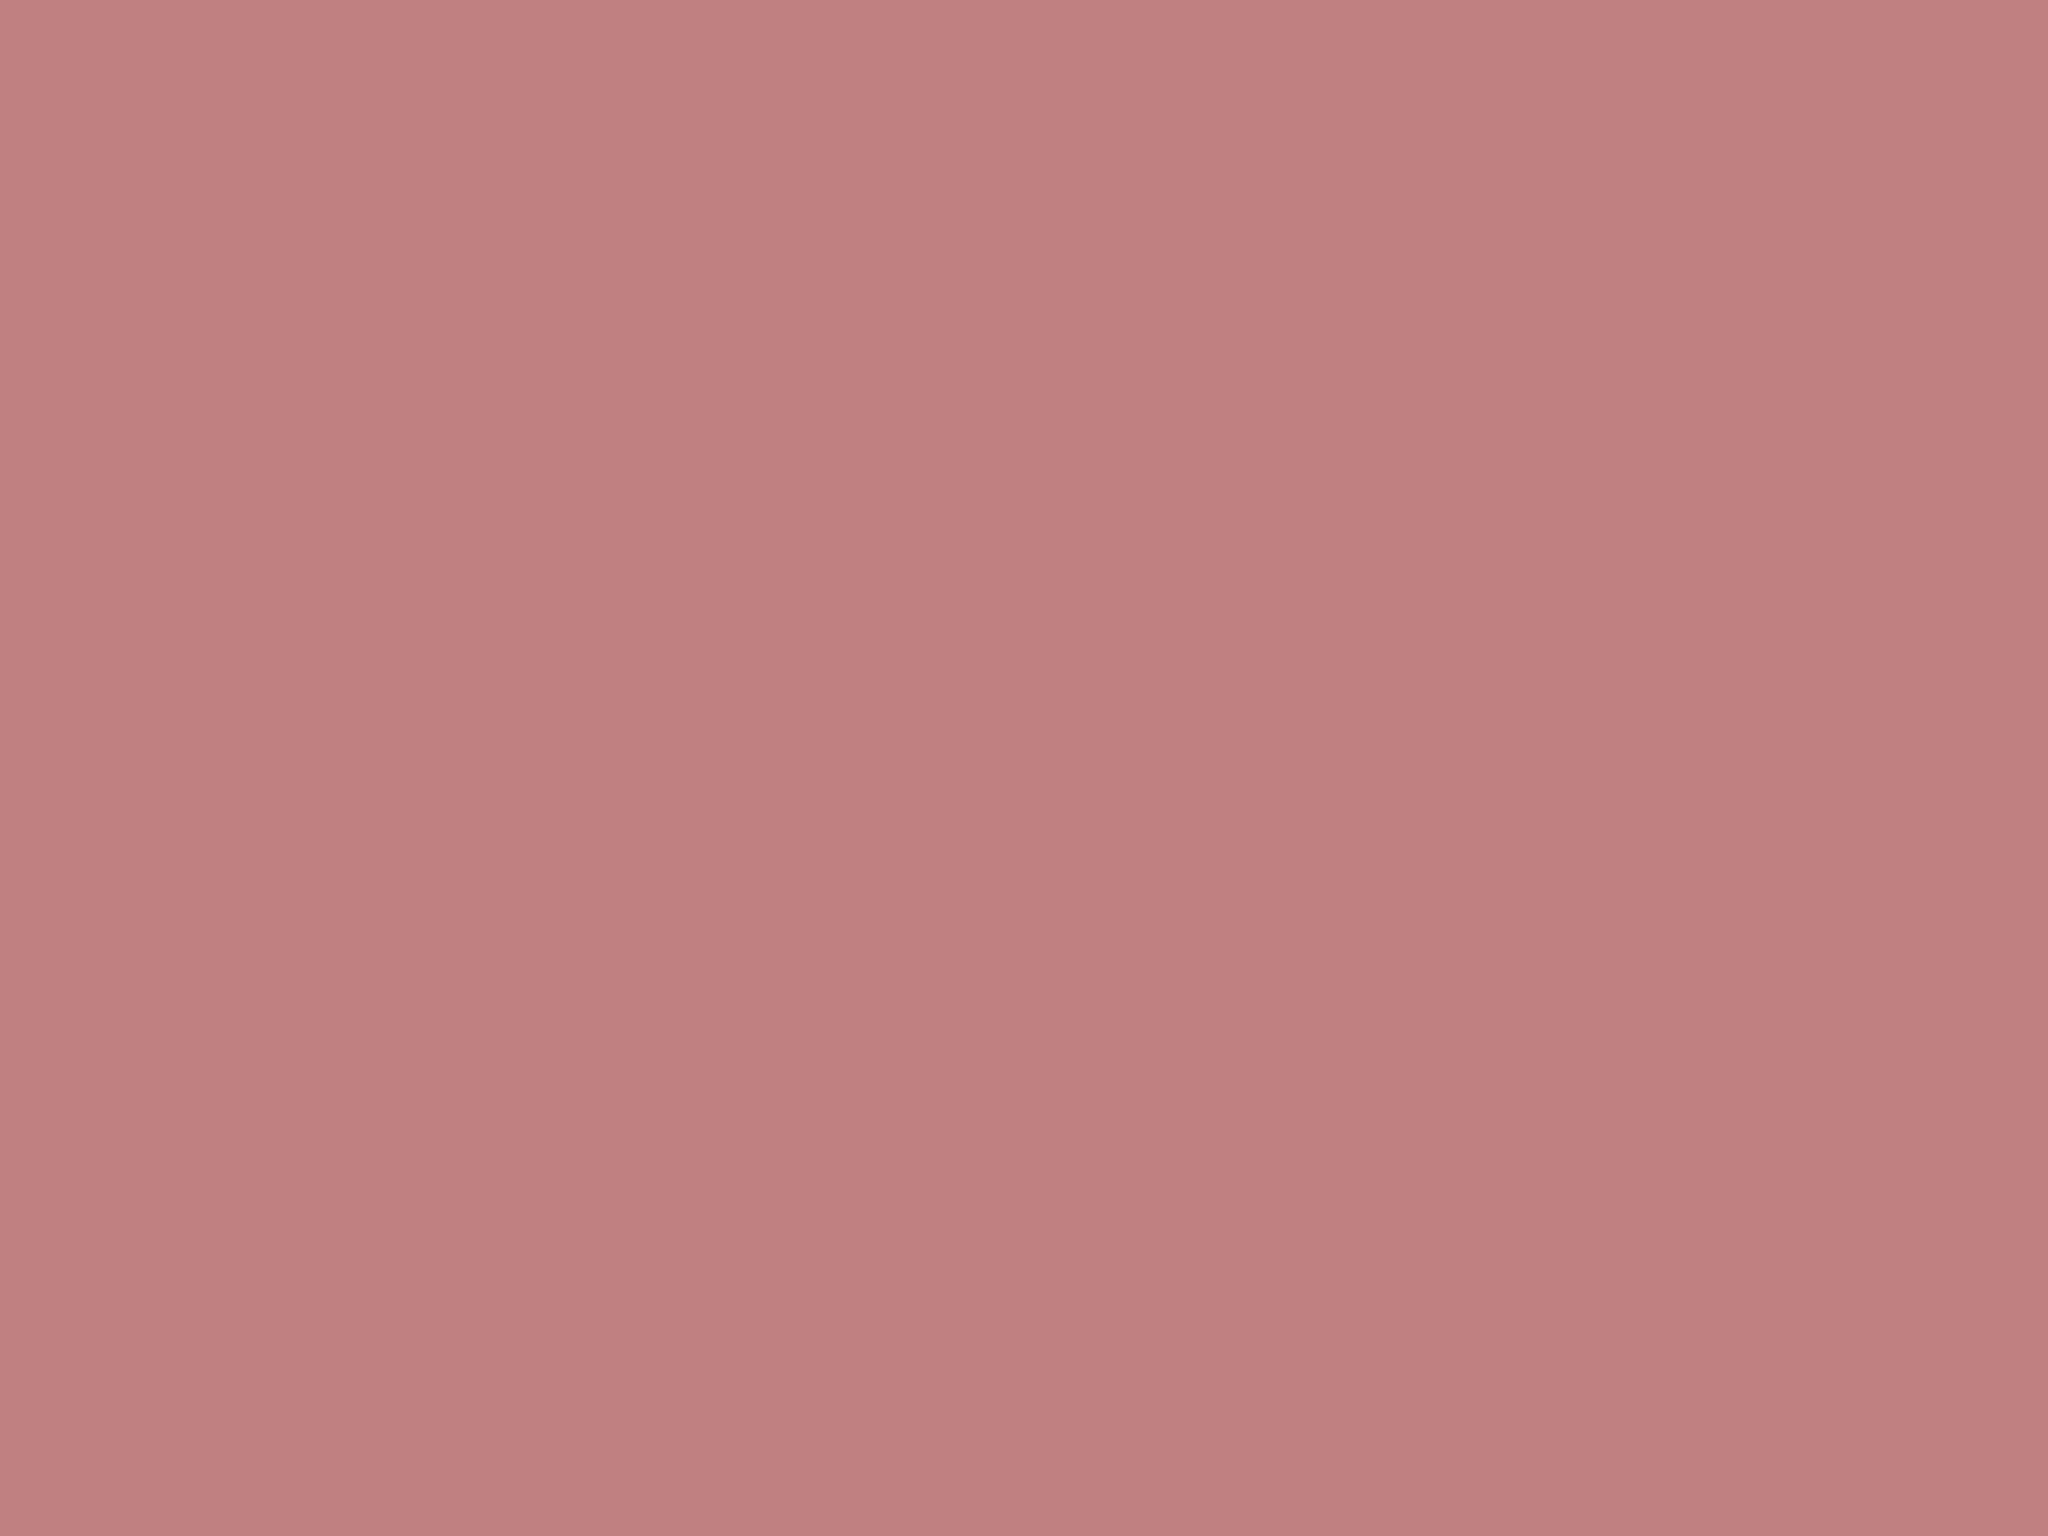 2048x1536 Old Rose Solid Color Background